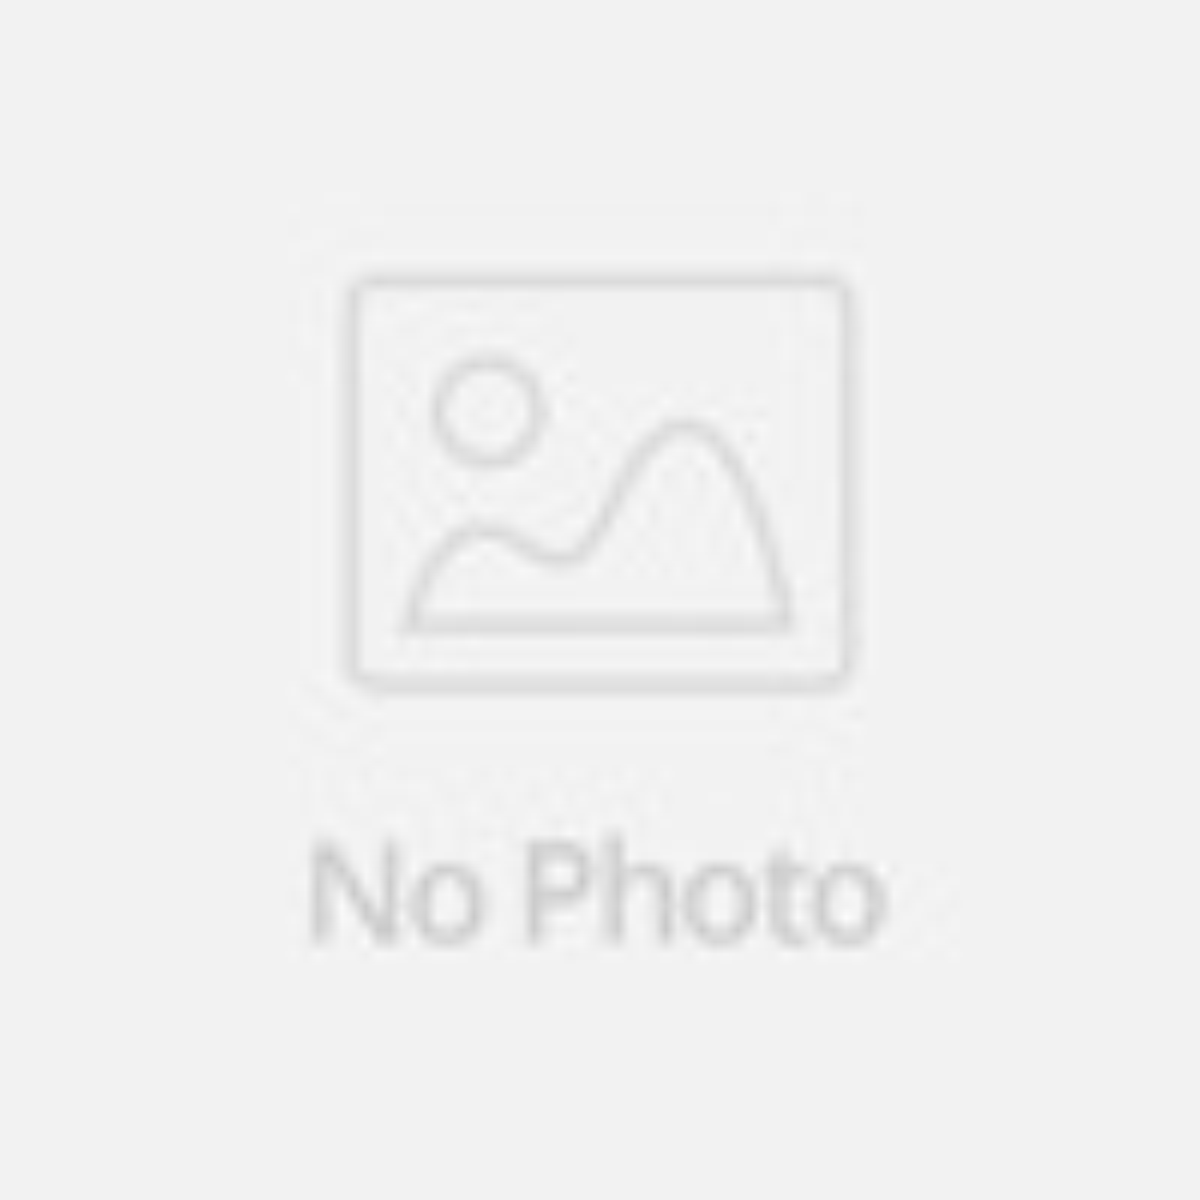 Kapu2013 golf ball cap big male large brim strawhat sun hat sunbonnet(China (Mainland))